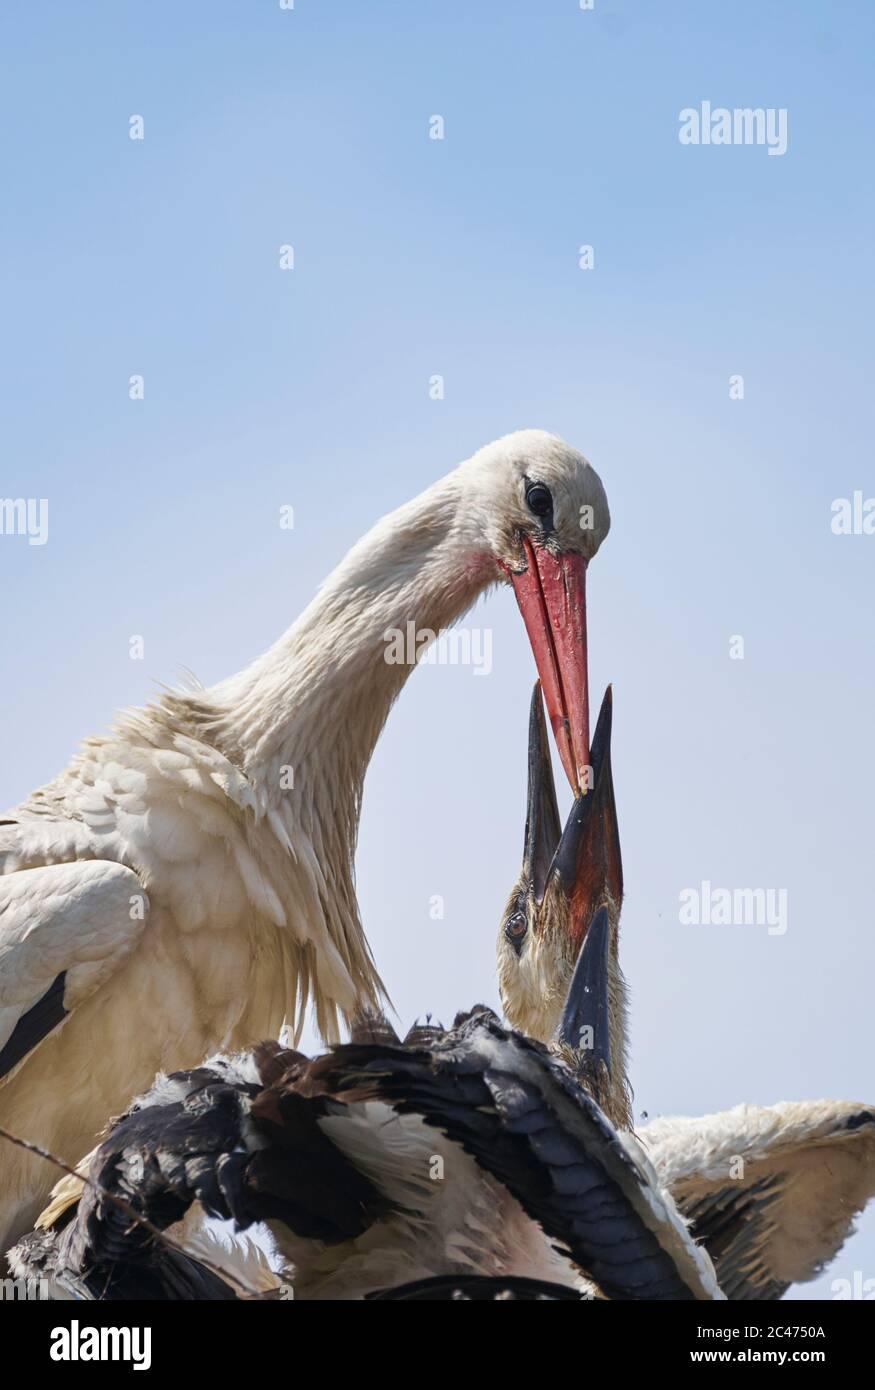 White stork (Ciconia ciconia) feeding its greedy young Stock Photo